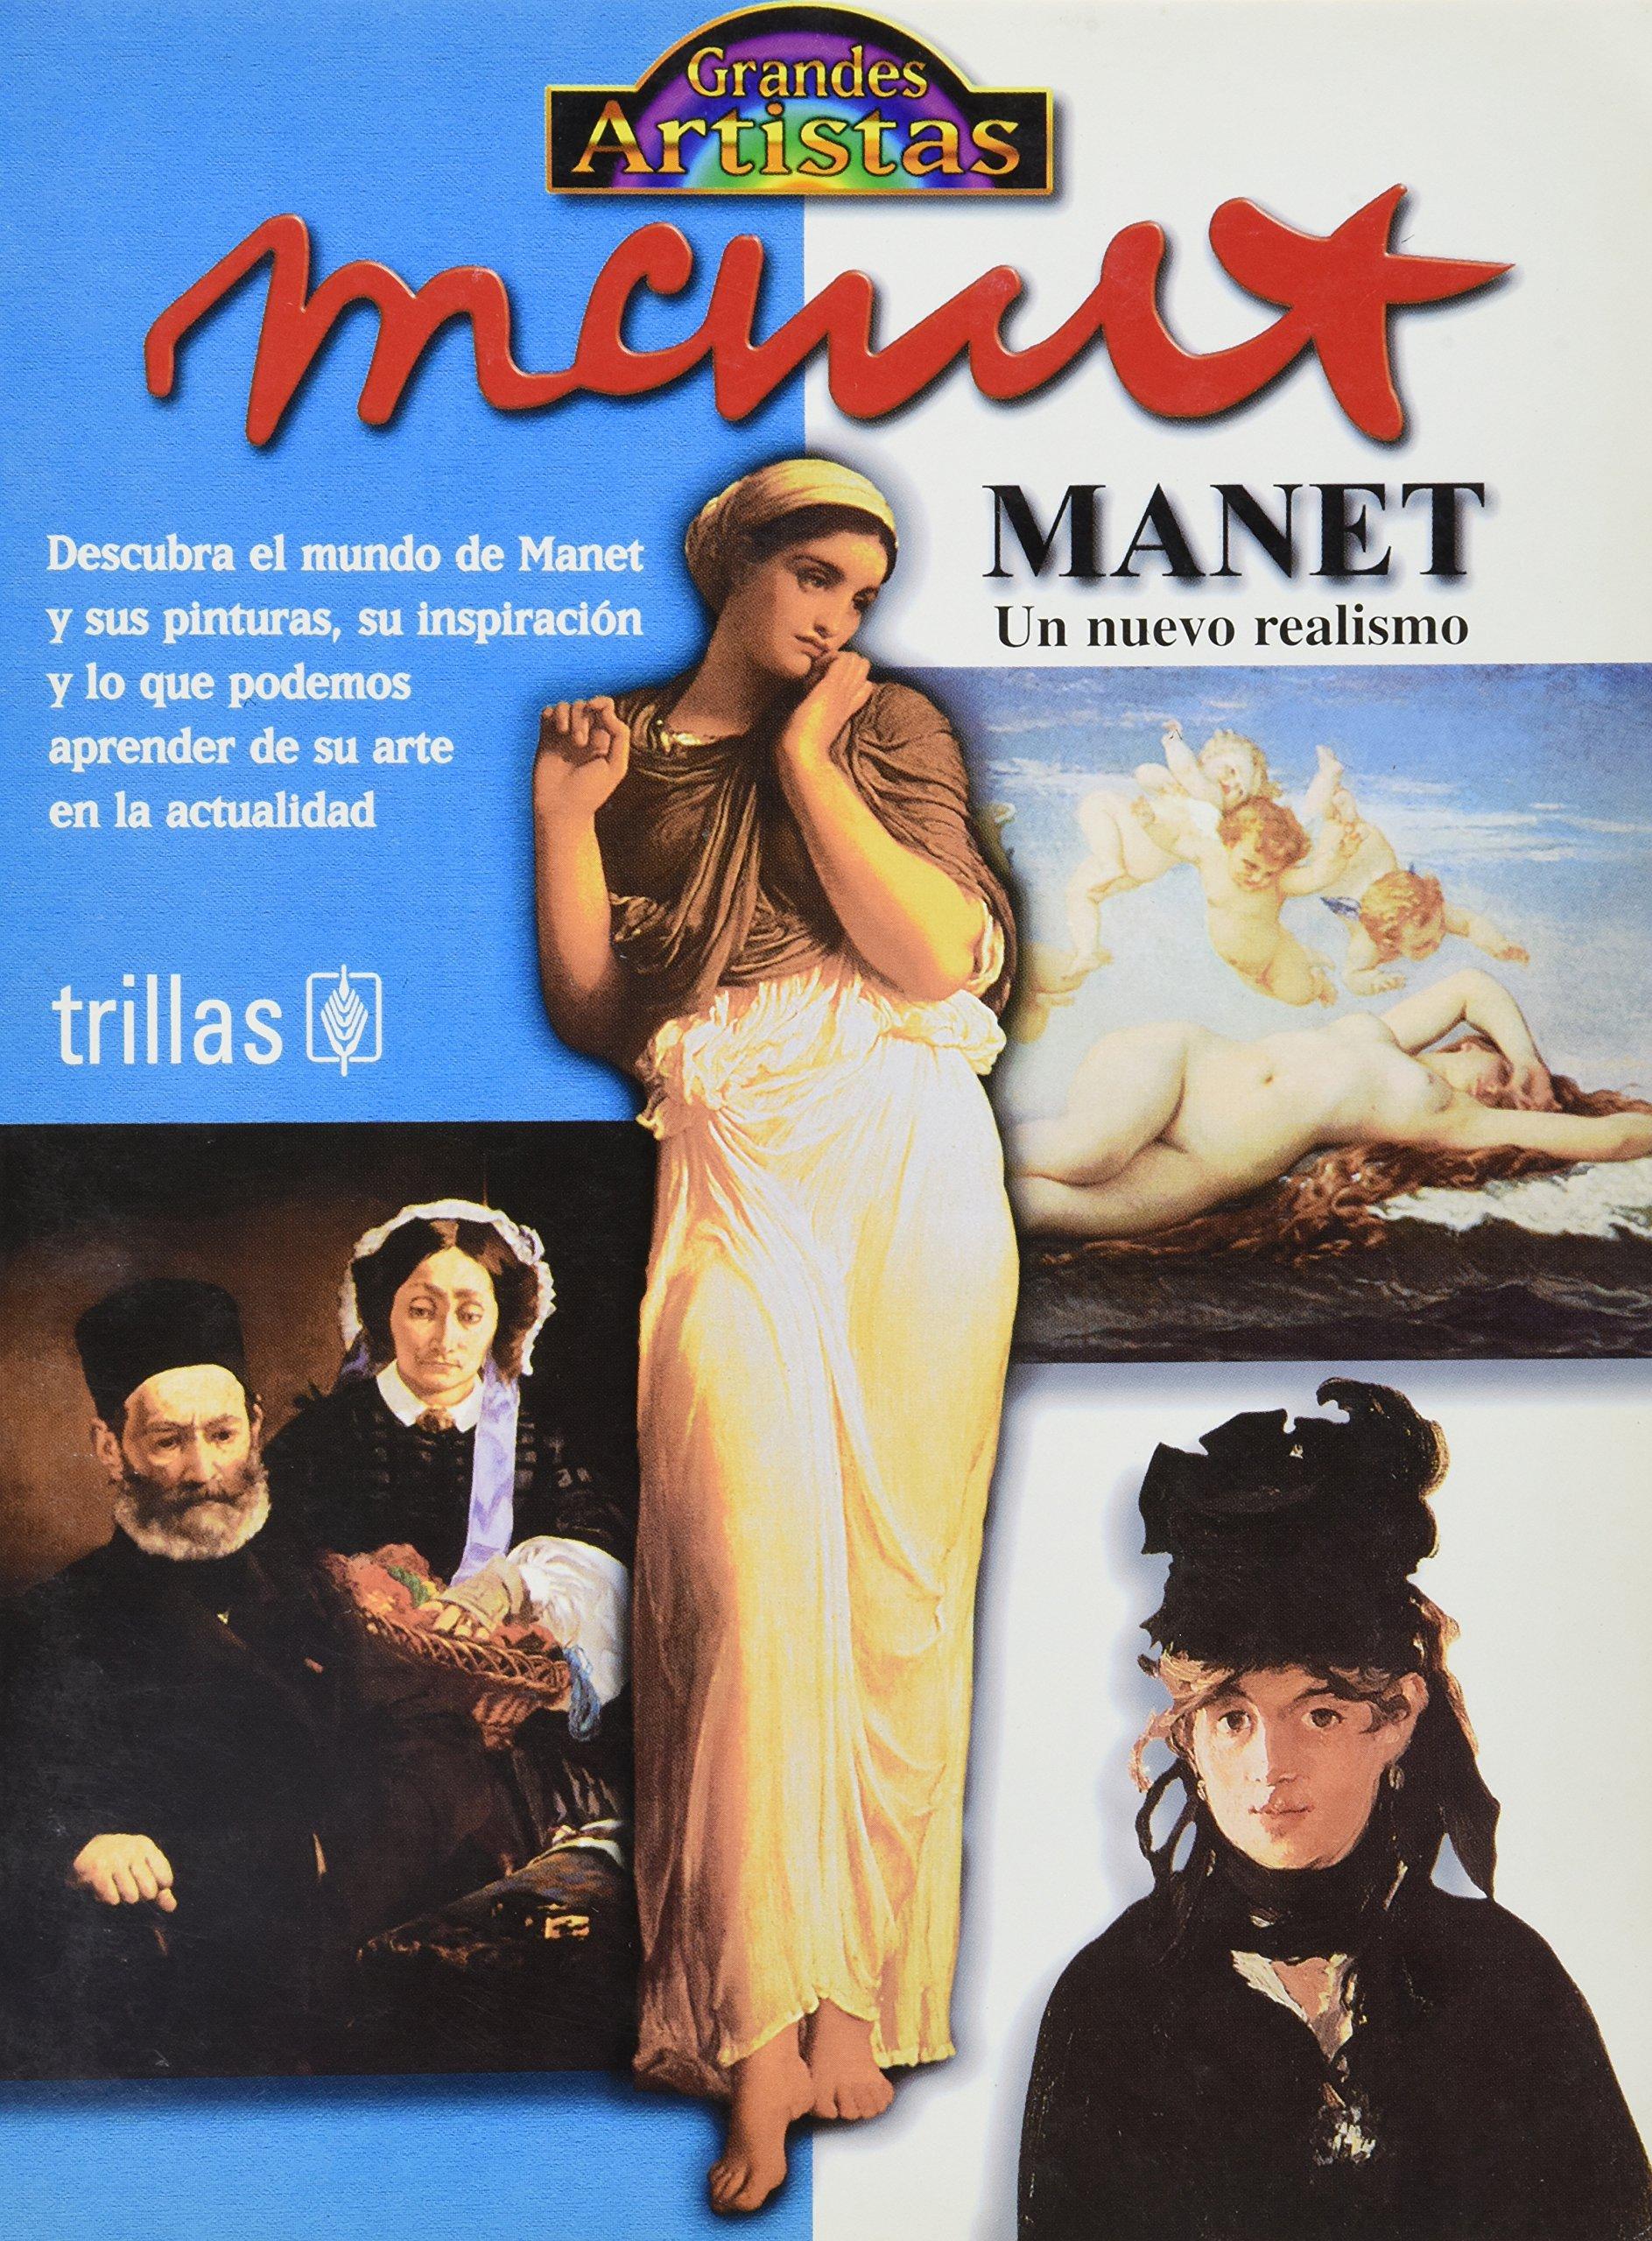 Manet 6: Un Nuevo Realismo (Grandes Artistas/ Great Artists) (Spanish Edition): David Spence: 9789682459085: Amazon.com: Books